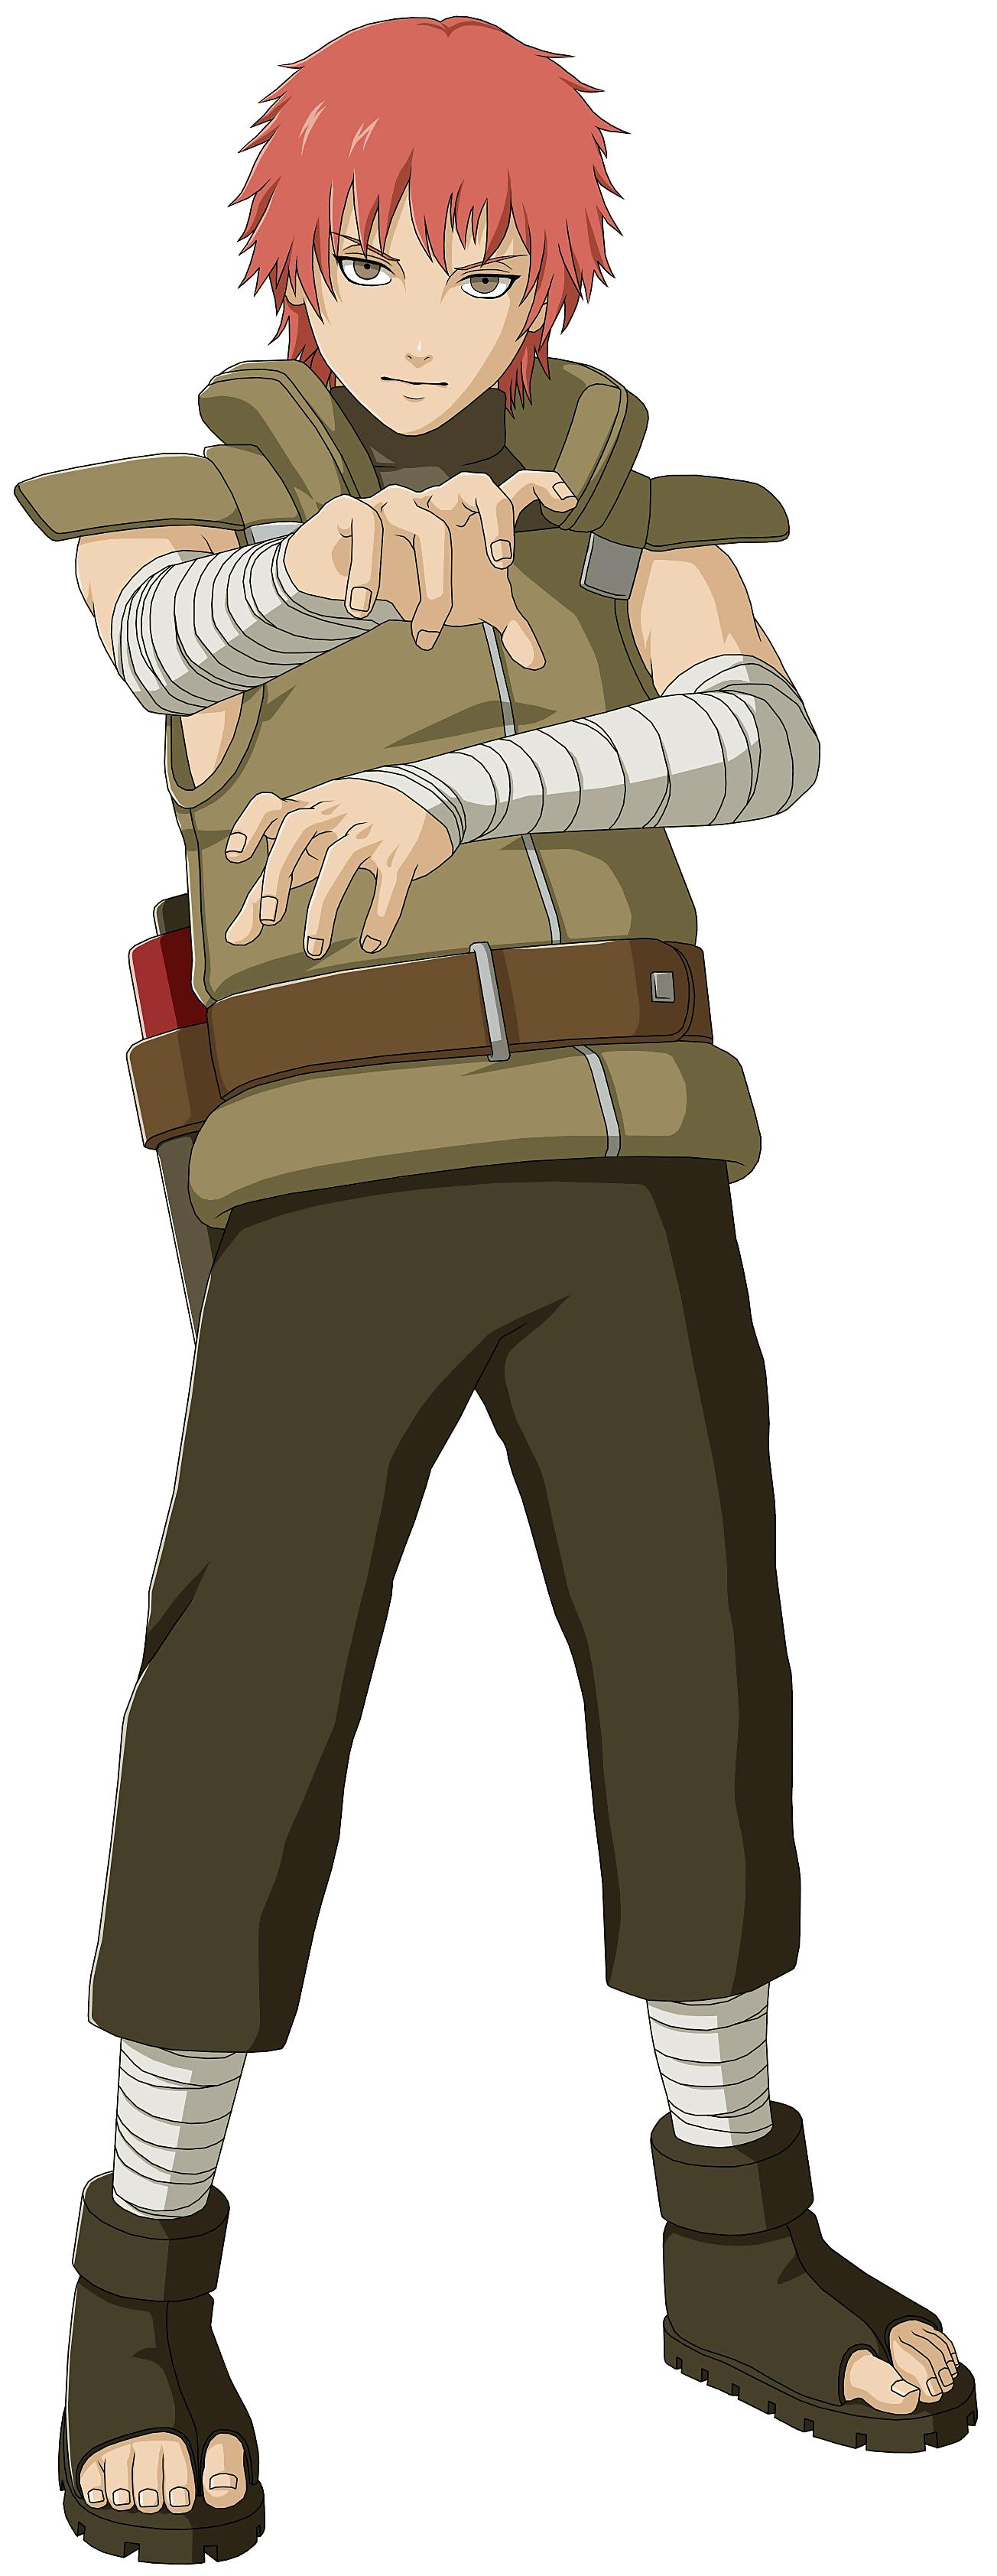 10 Interesting Facts About Sasori   AnimeBlog